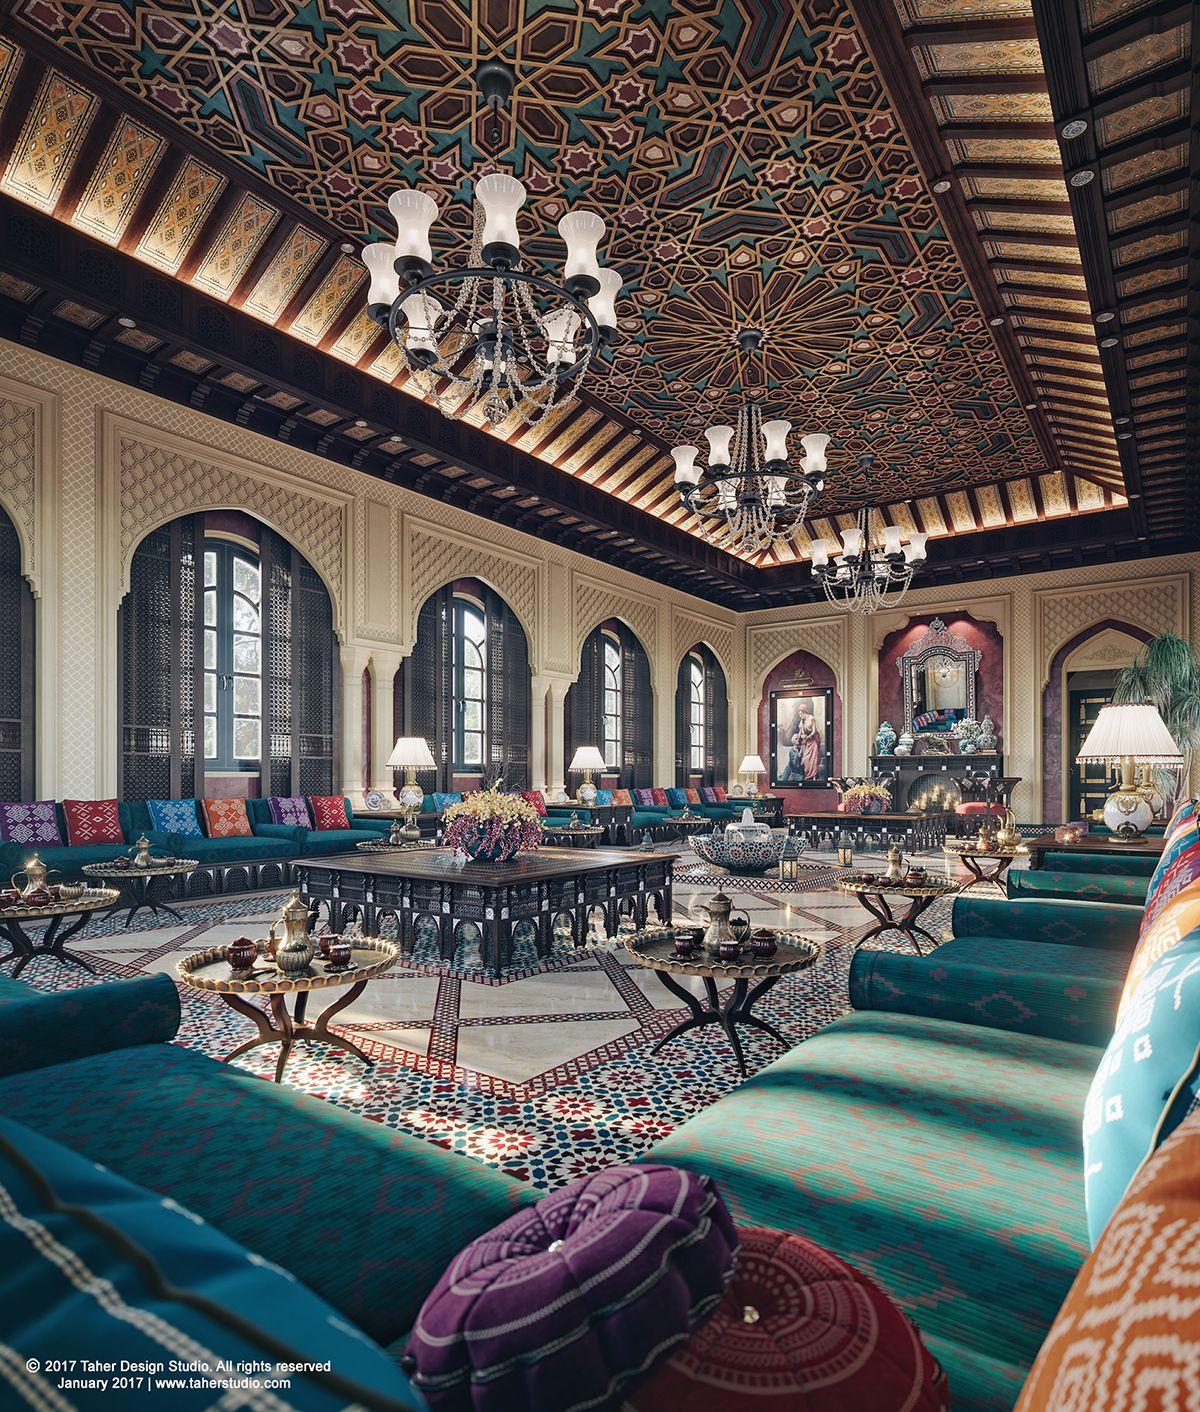 The Majlis By Taher Studio On Behance Arabian Decor Luxury Mansions Interior Arabic Decor